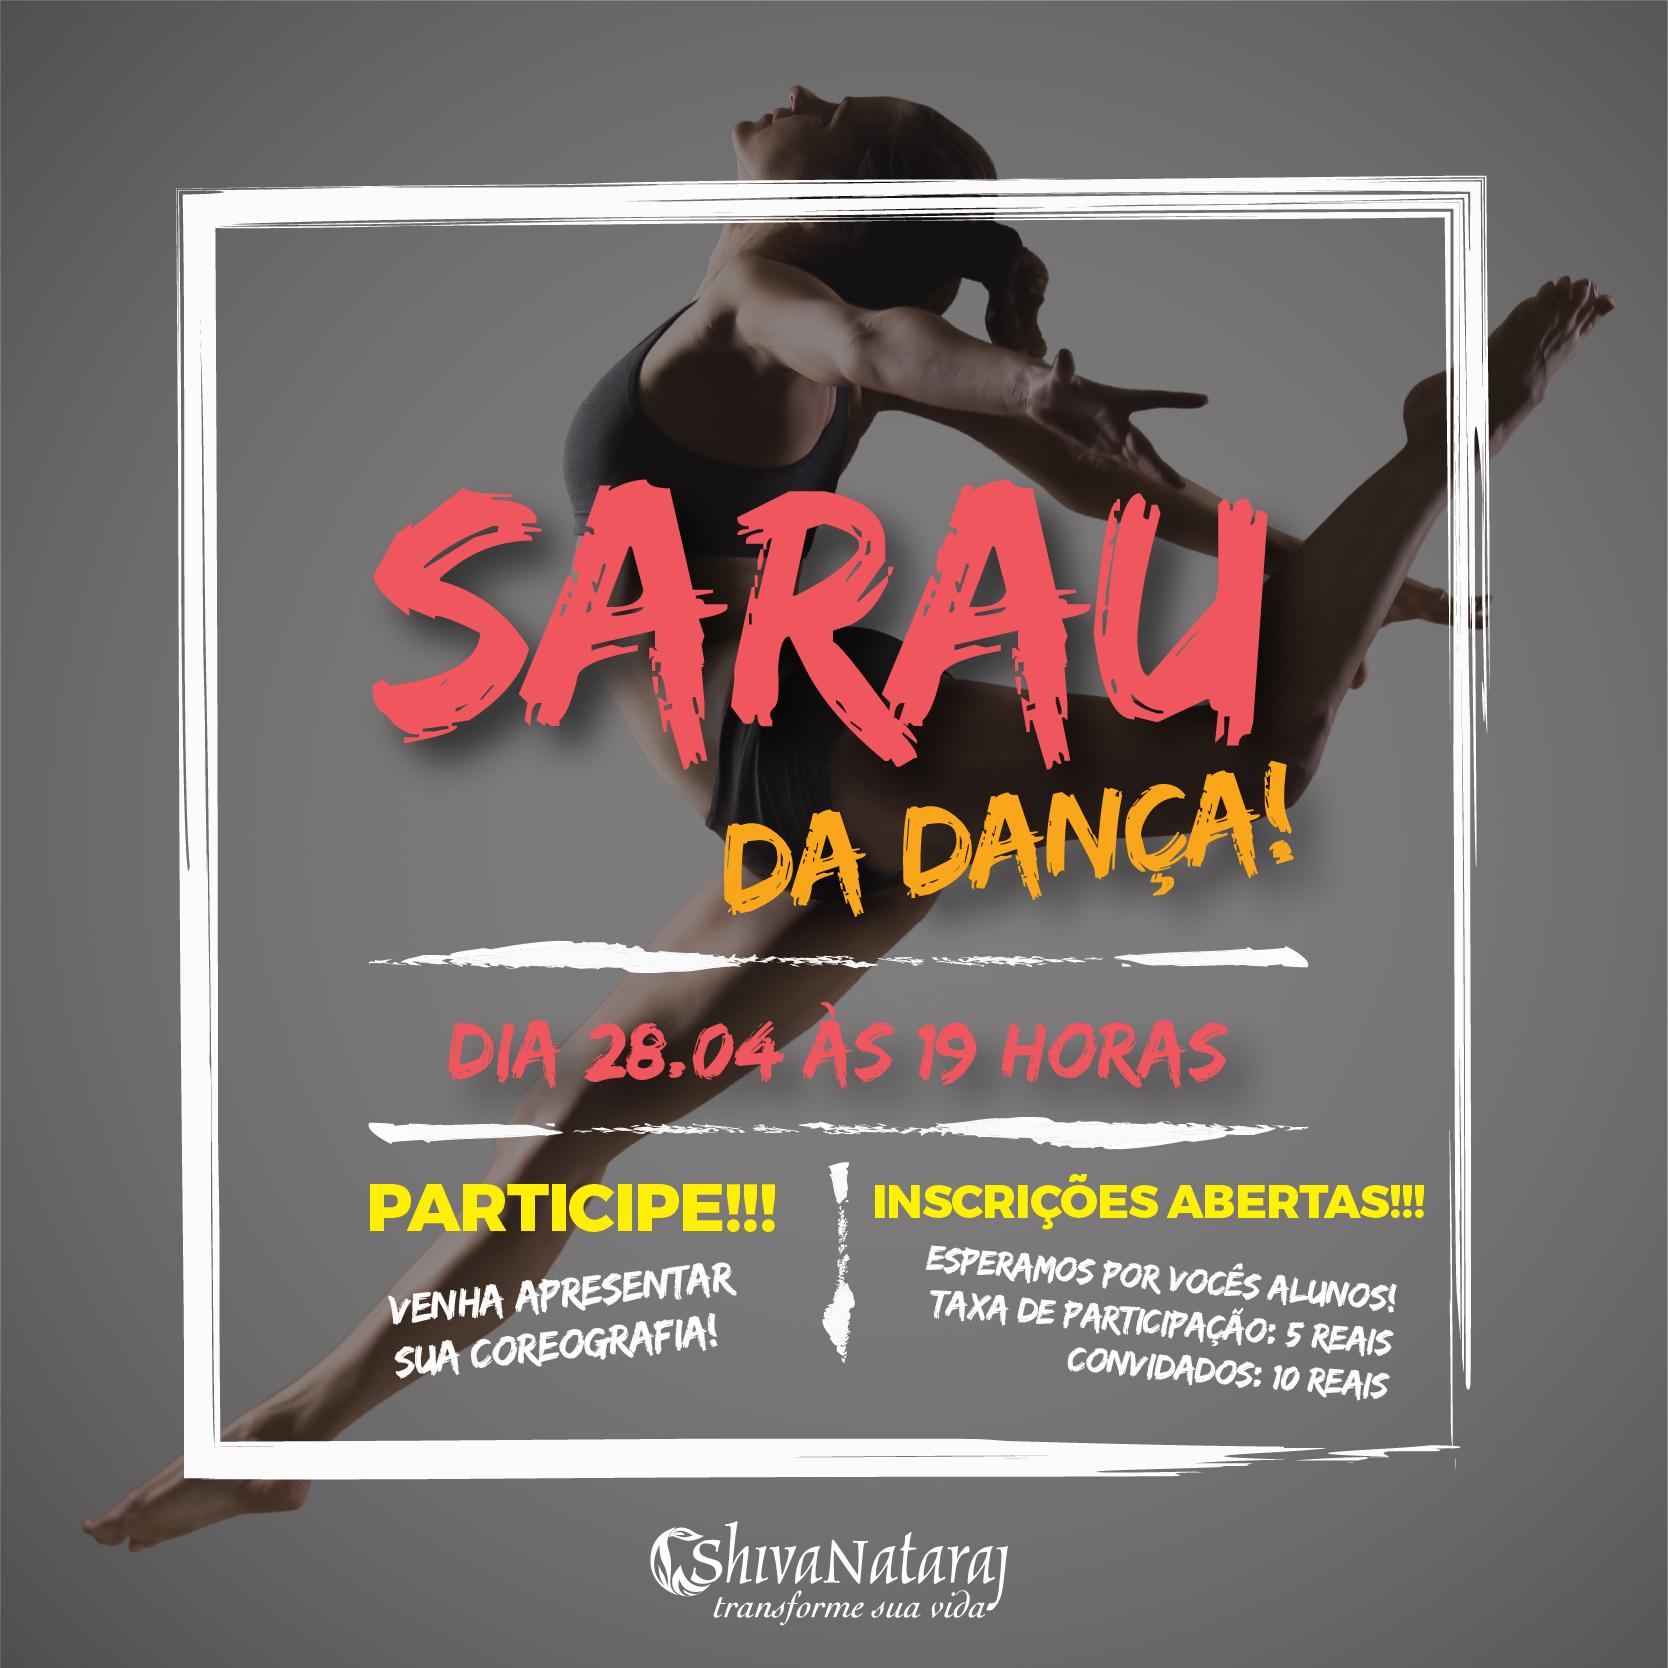 sarau_da_danca_shiva_nataraj-01